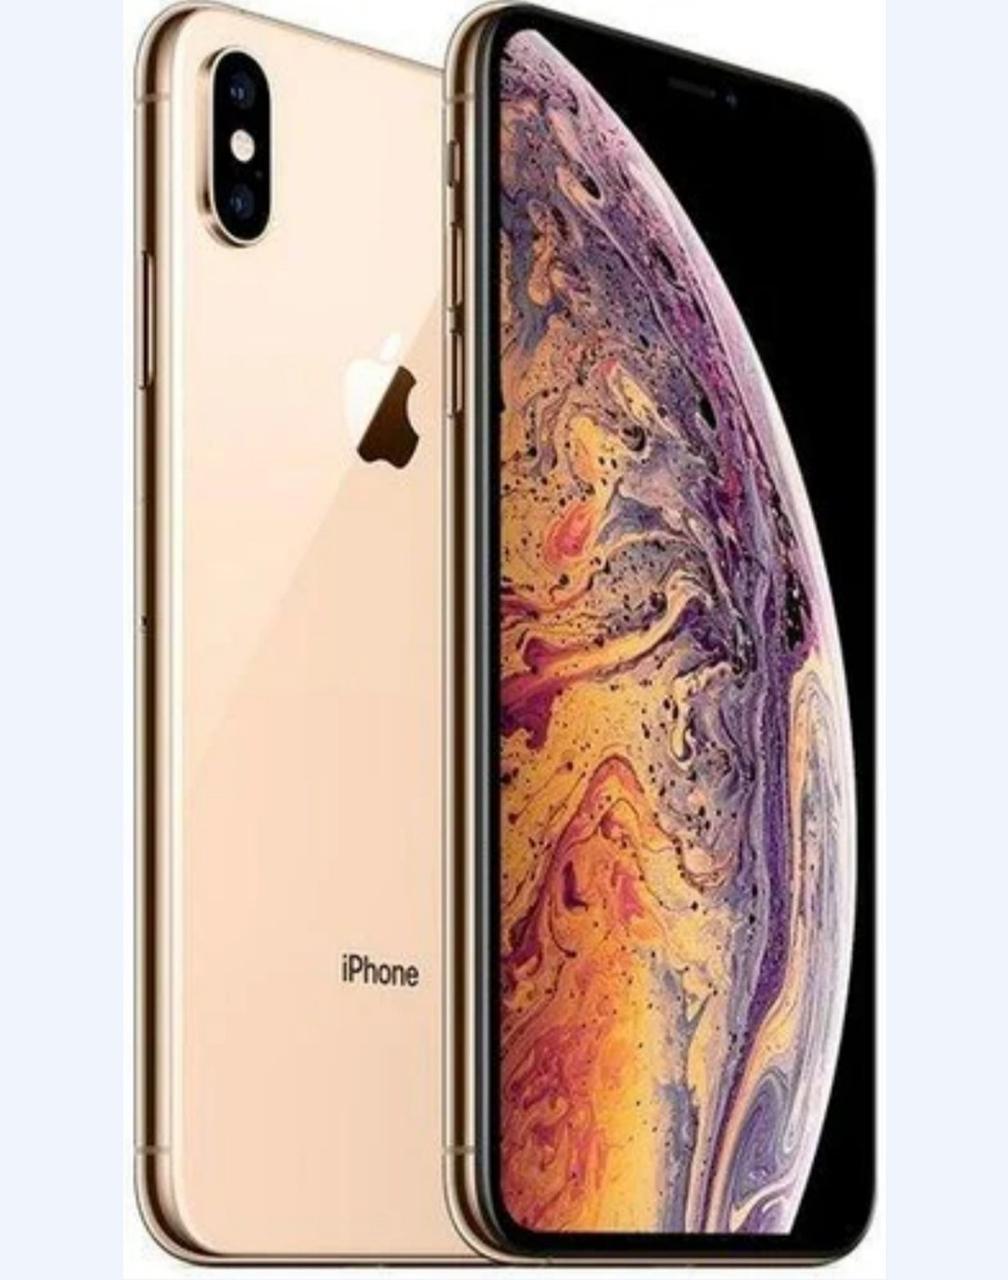 Apple iPhone XS Max 64GB Gold (MT532) Refurbished